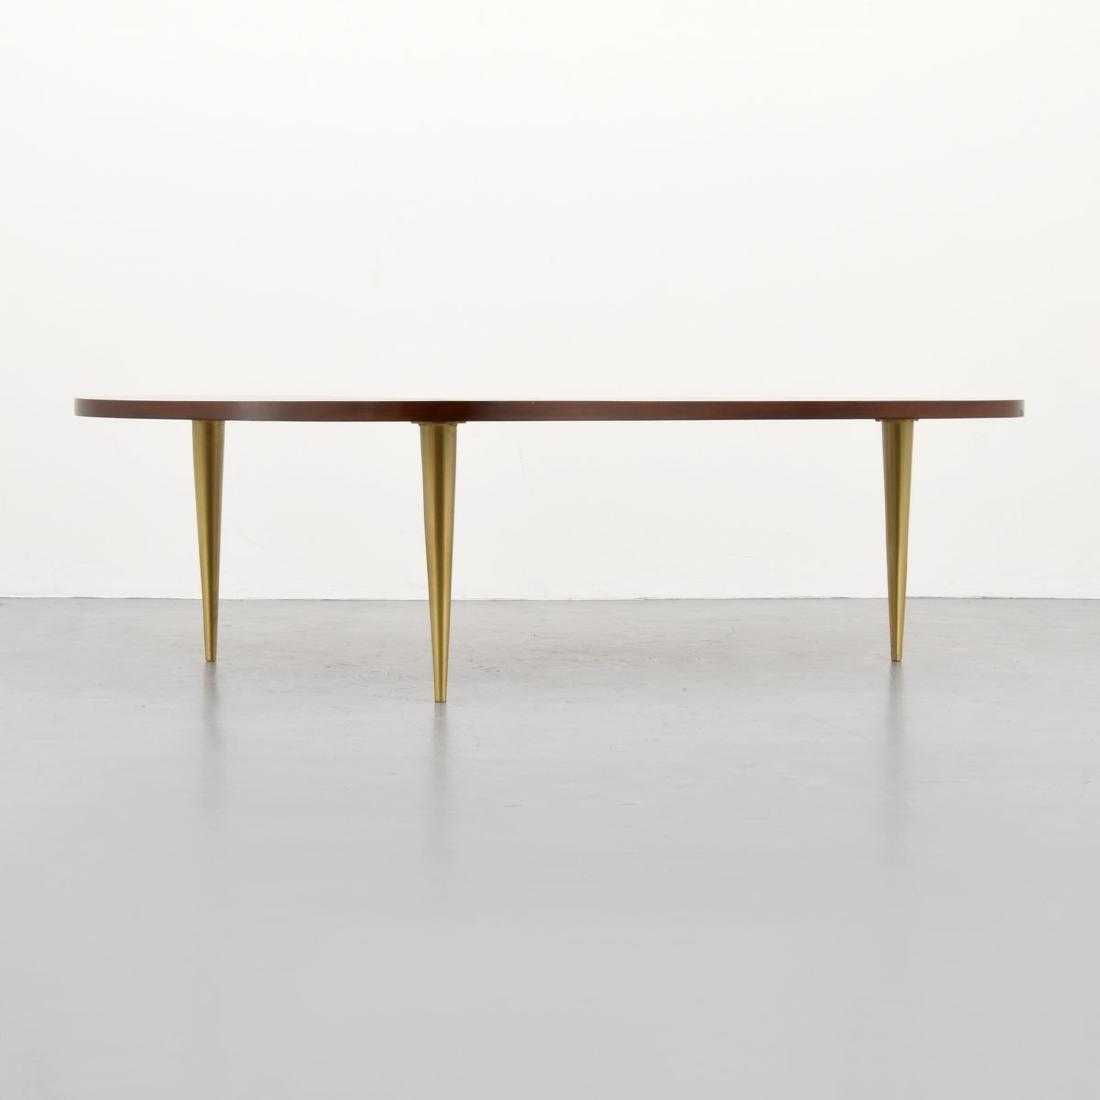 T.H. Robsjohn-Gibbings Biomorphic Coffee Table - 4